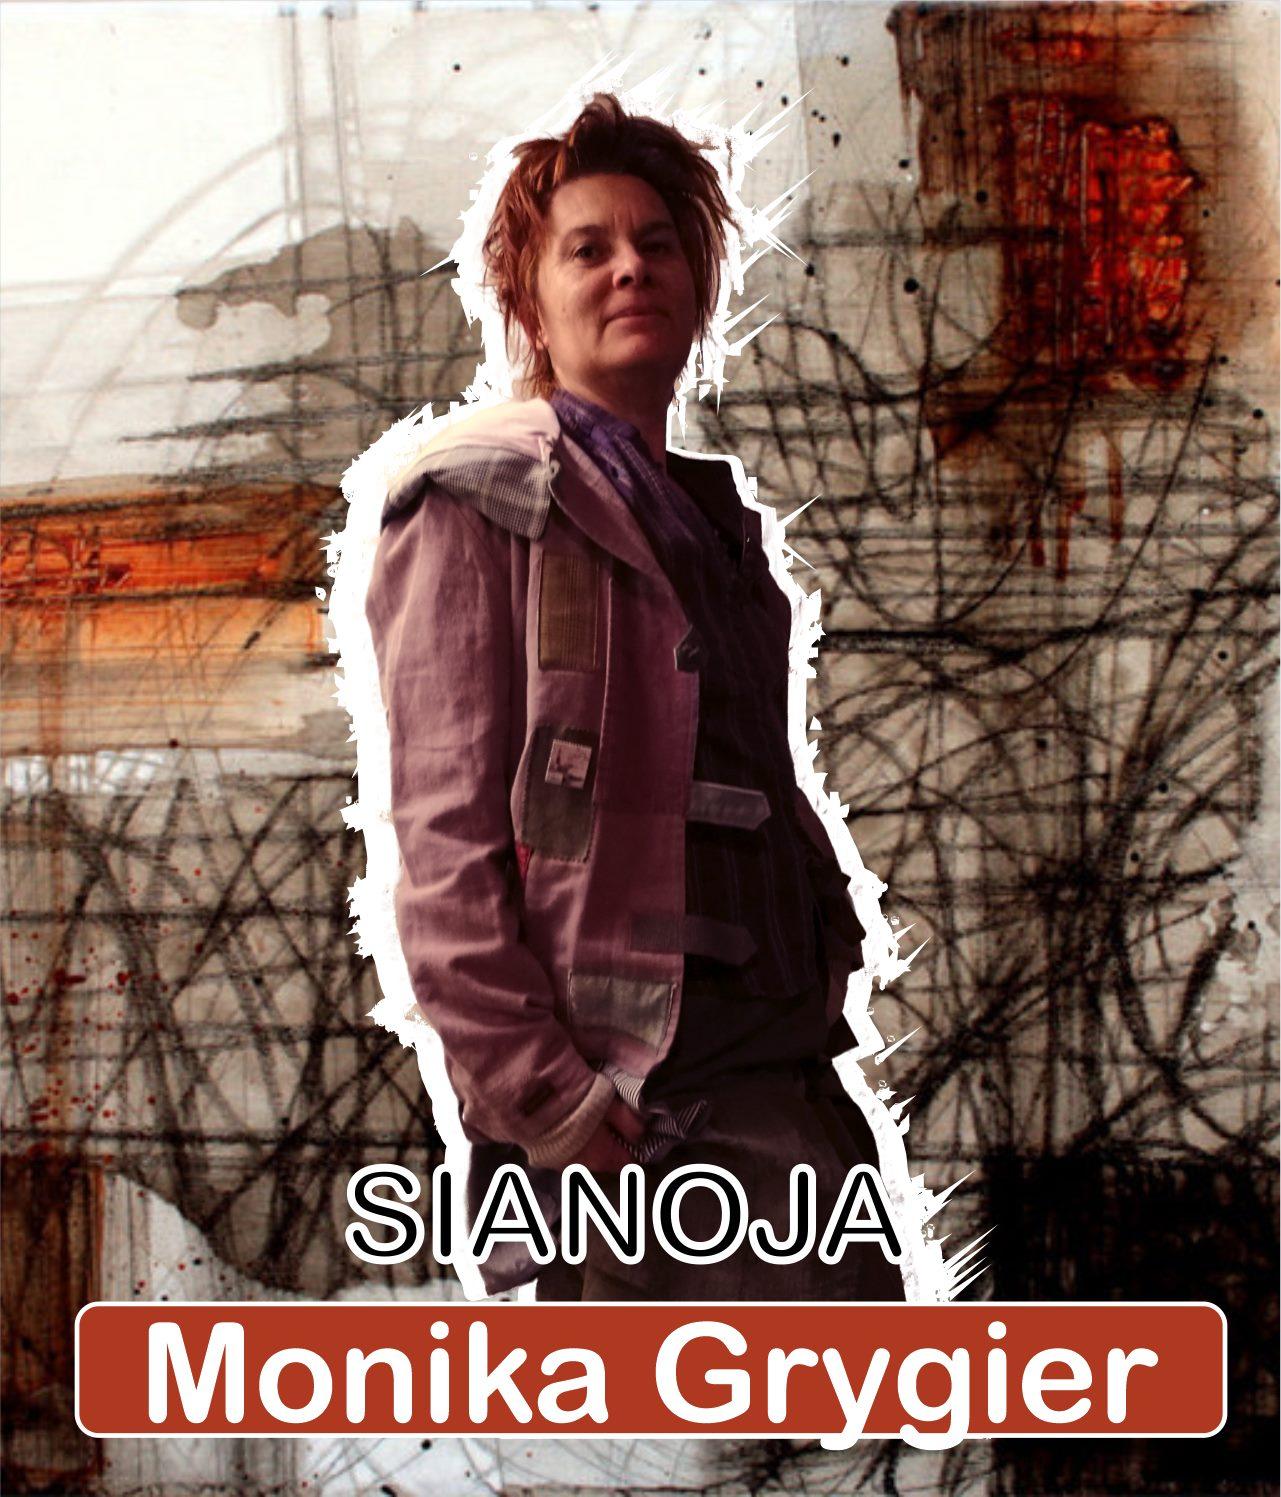 MONIKA GRYGIER